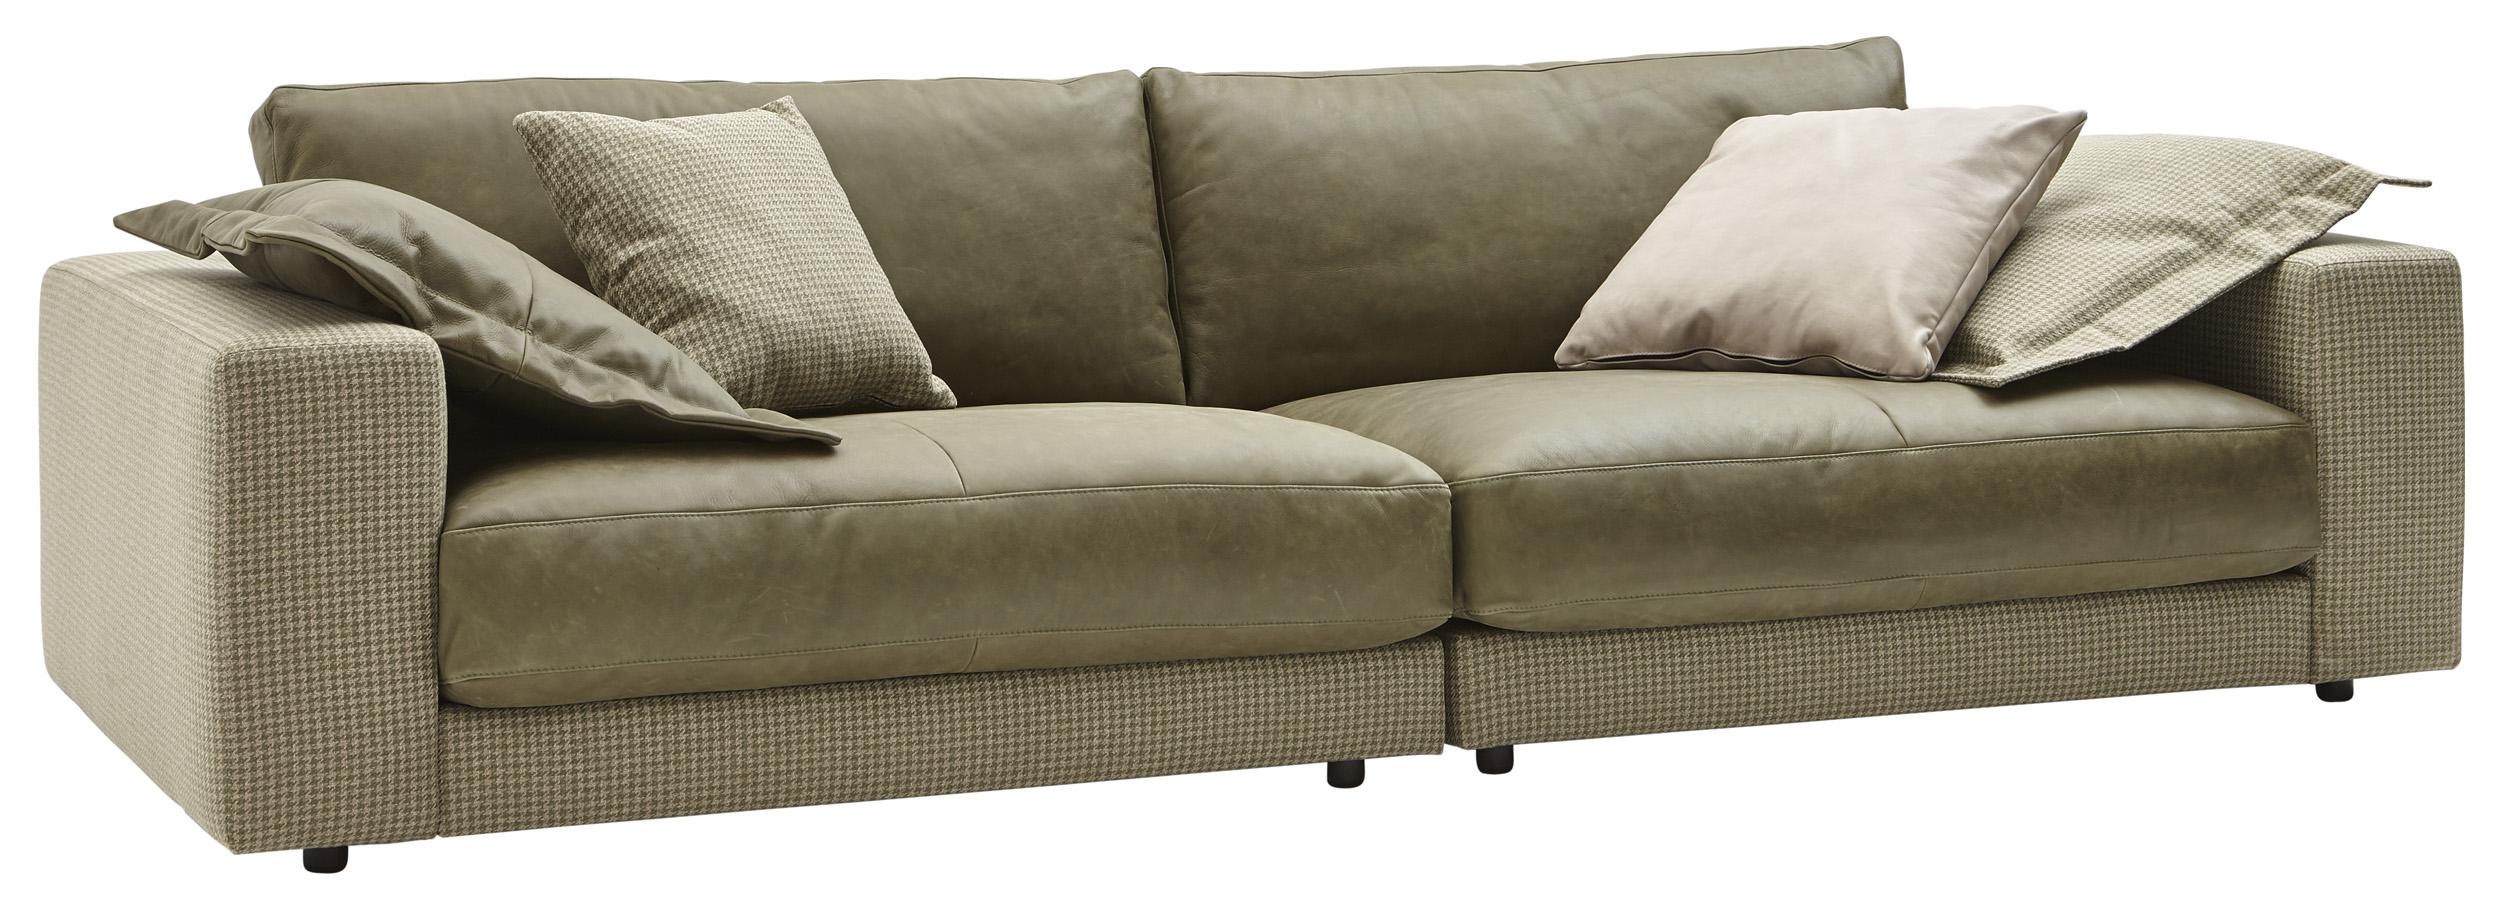 Full Size of Natura Sofa Love Newport Gebraucht Couch Kansas Pasadena Kaufen Brooklyn Livingston Denver Hussen Samt Landhausstil Ausziehbar Mit Schlaffunktion Federkern Sofa Natura Sofa